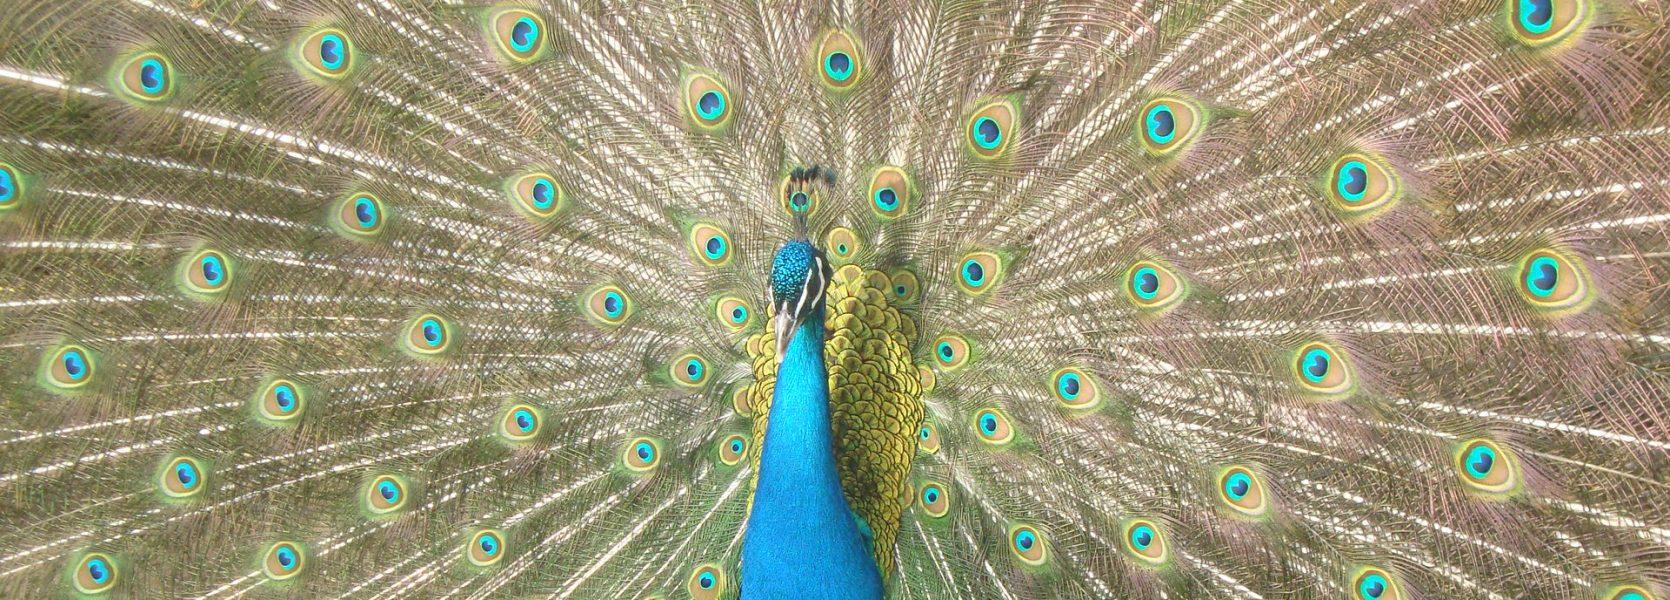 peacocks breeding season